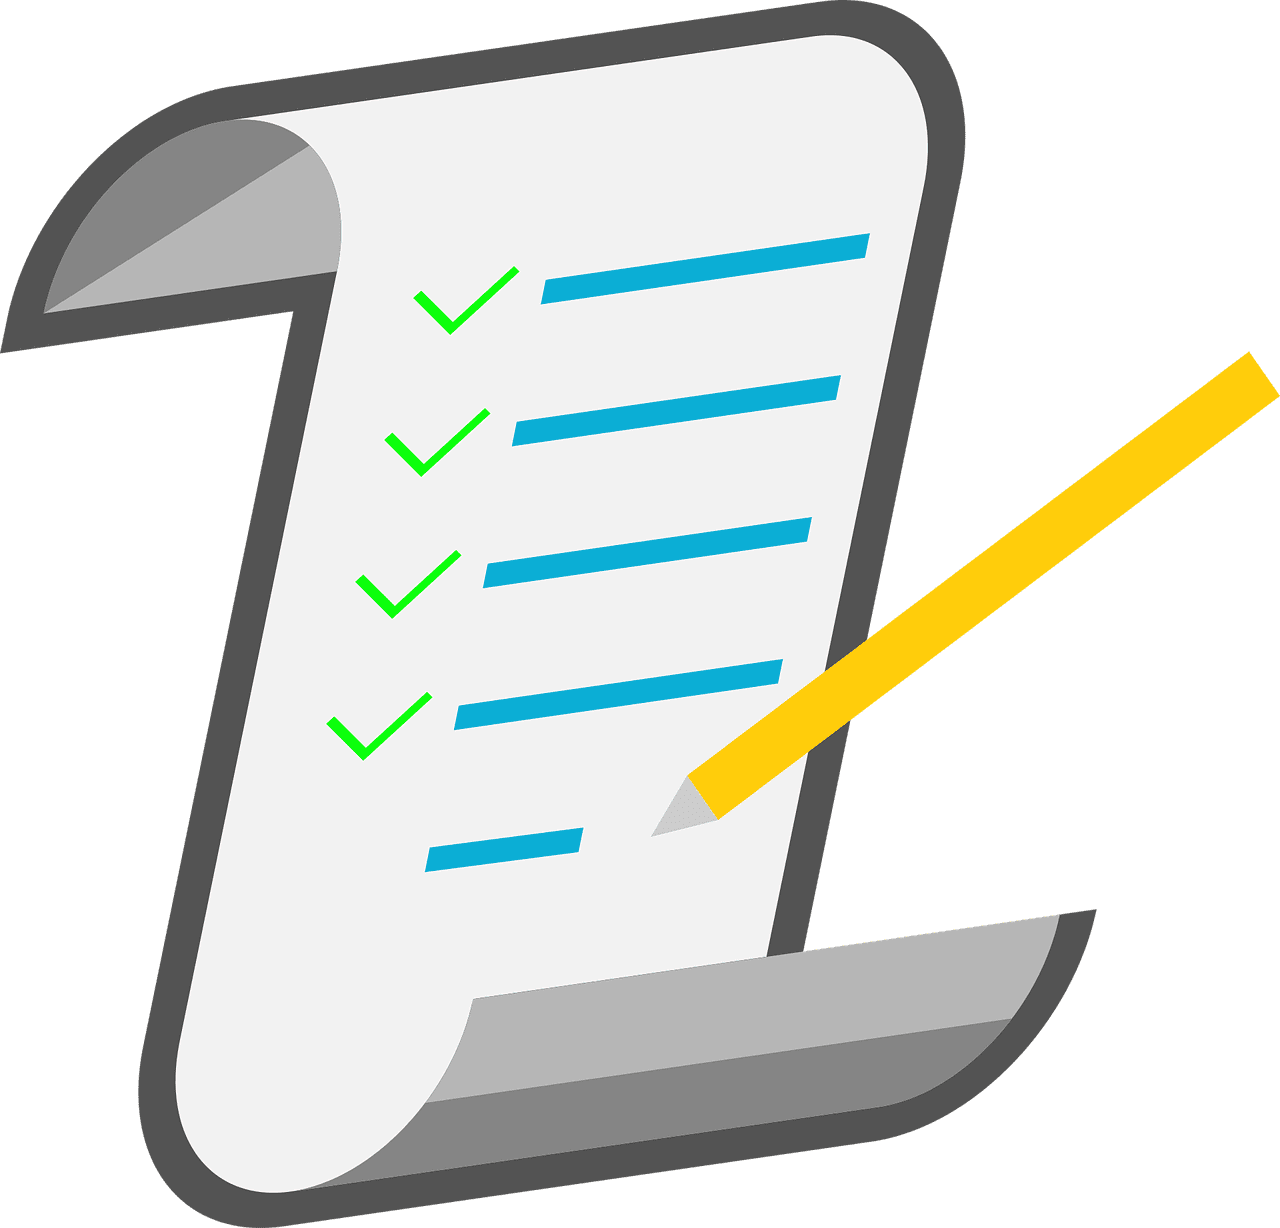 checklist-2024181_1280